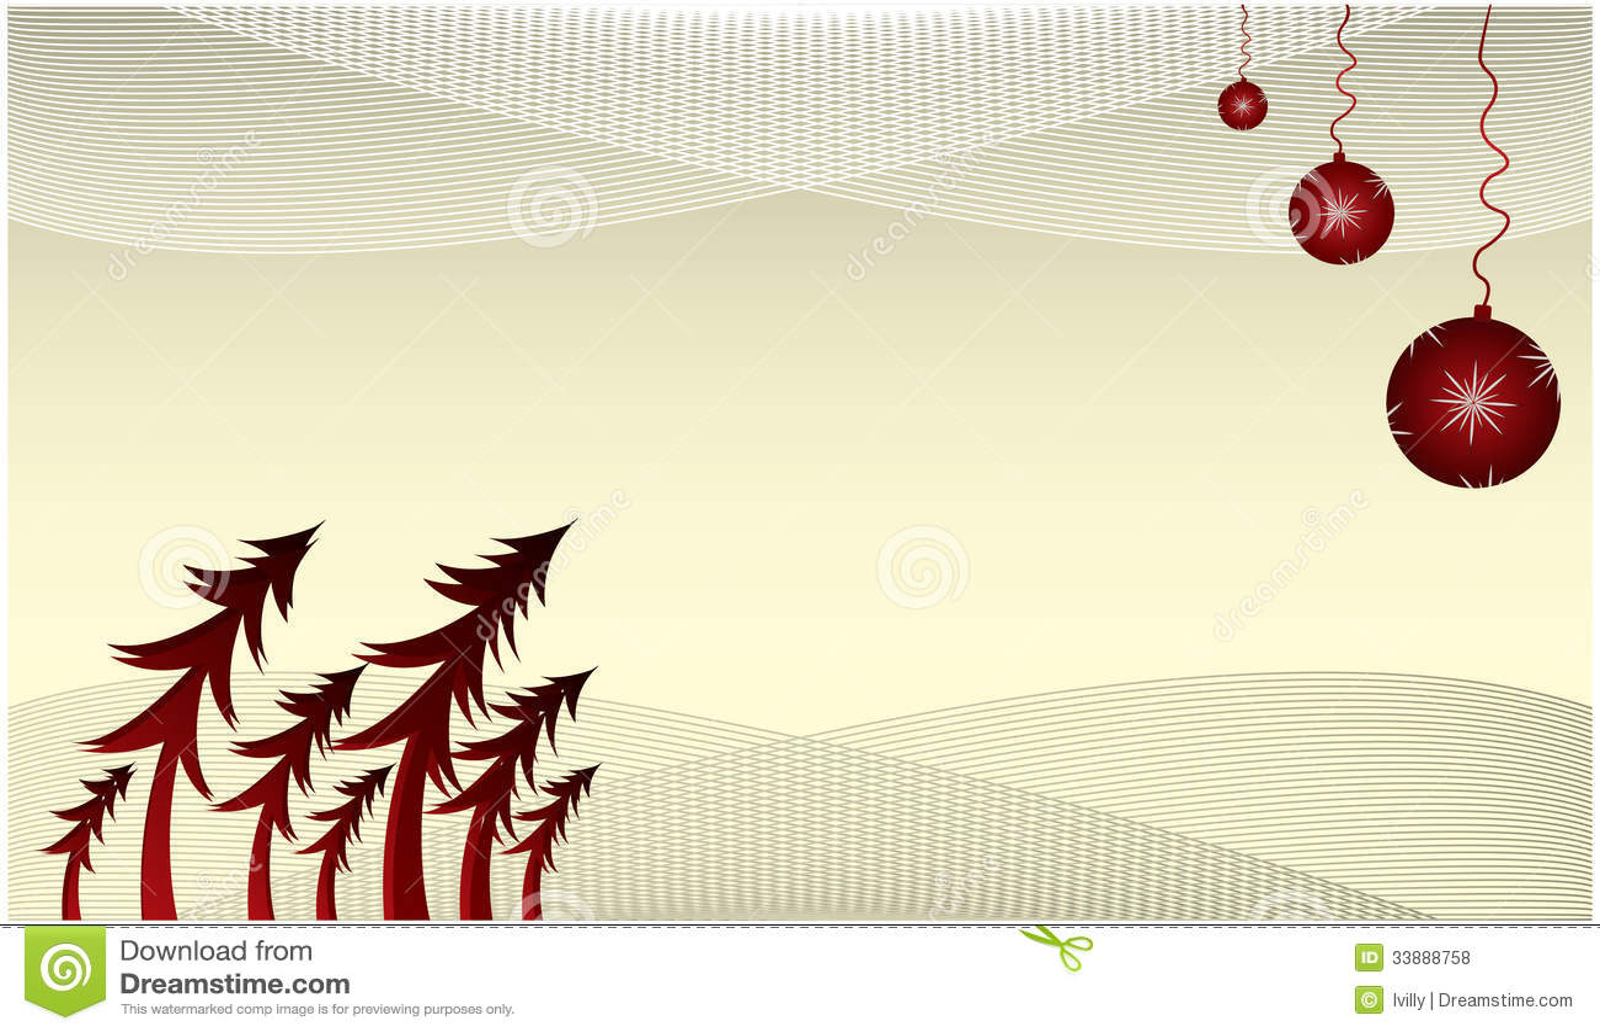 Holiday invitation backgrounds akbaeenw holiday invitation backgrounds stopboris Image collections